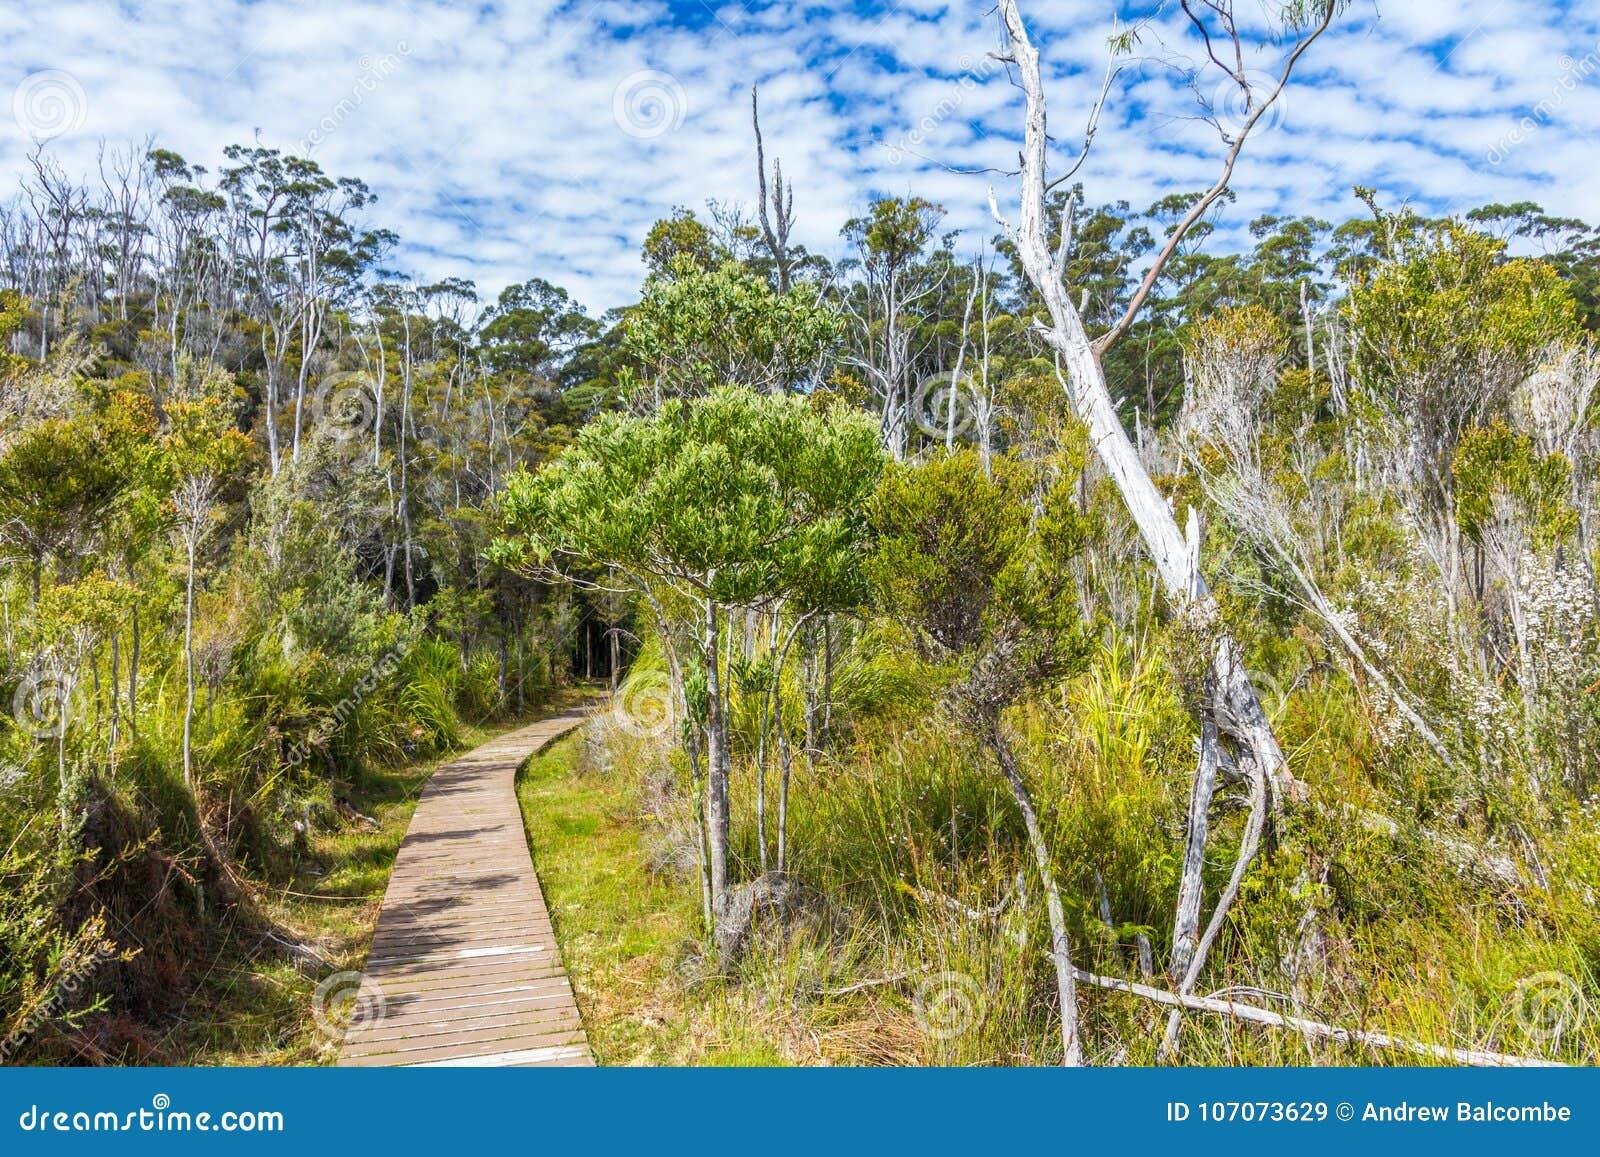 Hiking trail through Tasmanian wilderness at Hastings caves